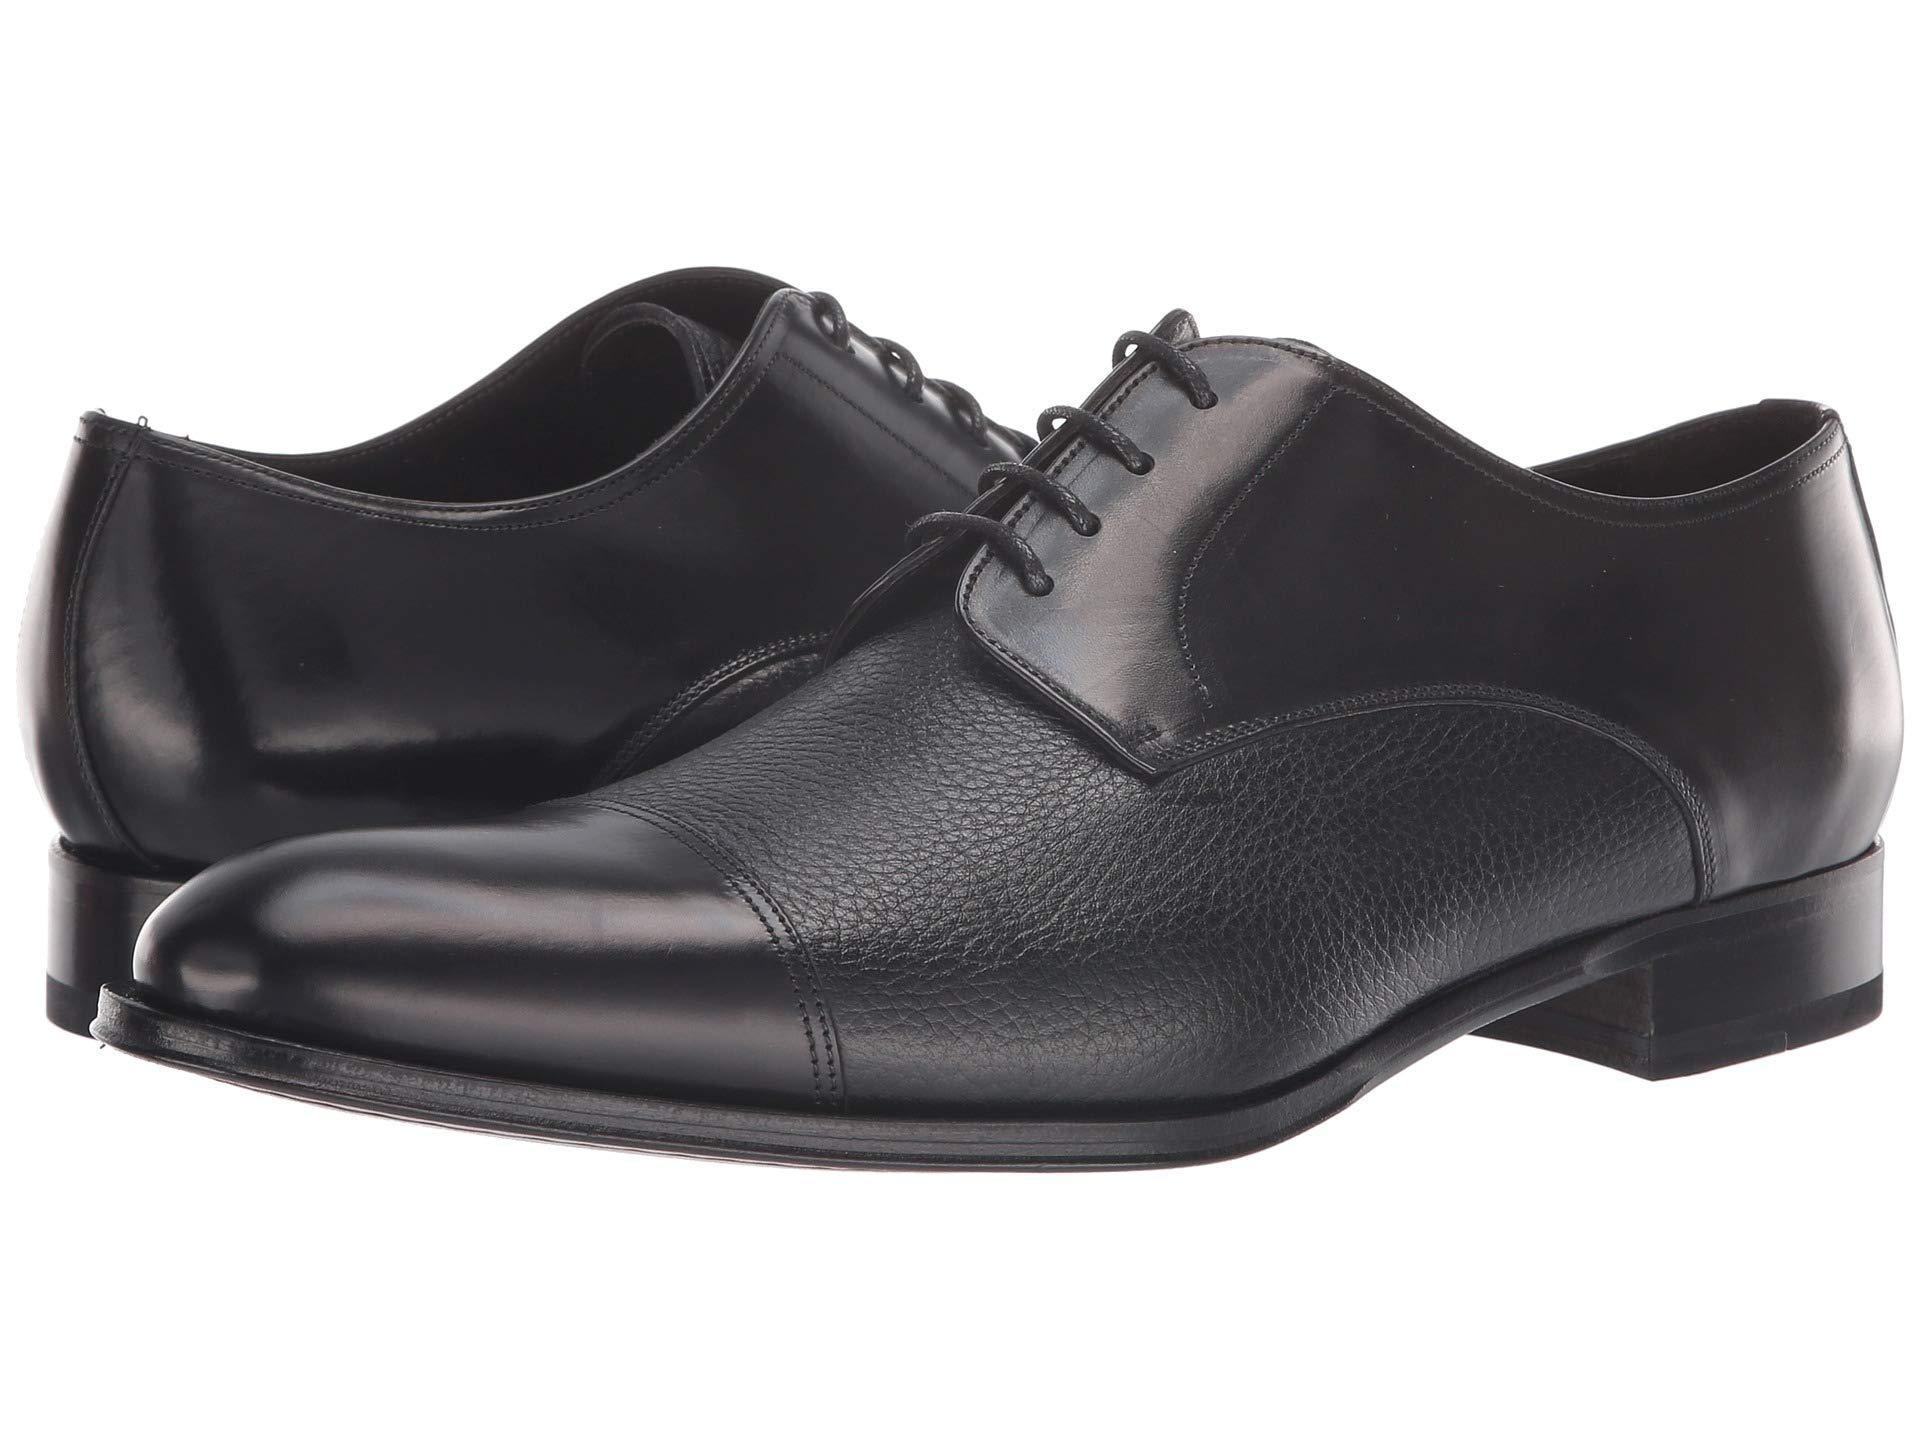 Boot New To Black York Madrid 5ZYd5vwx